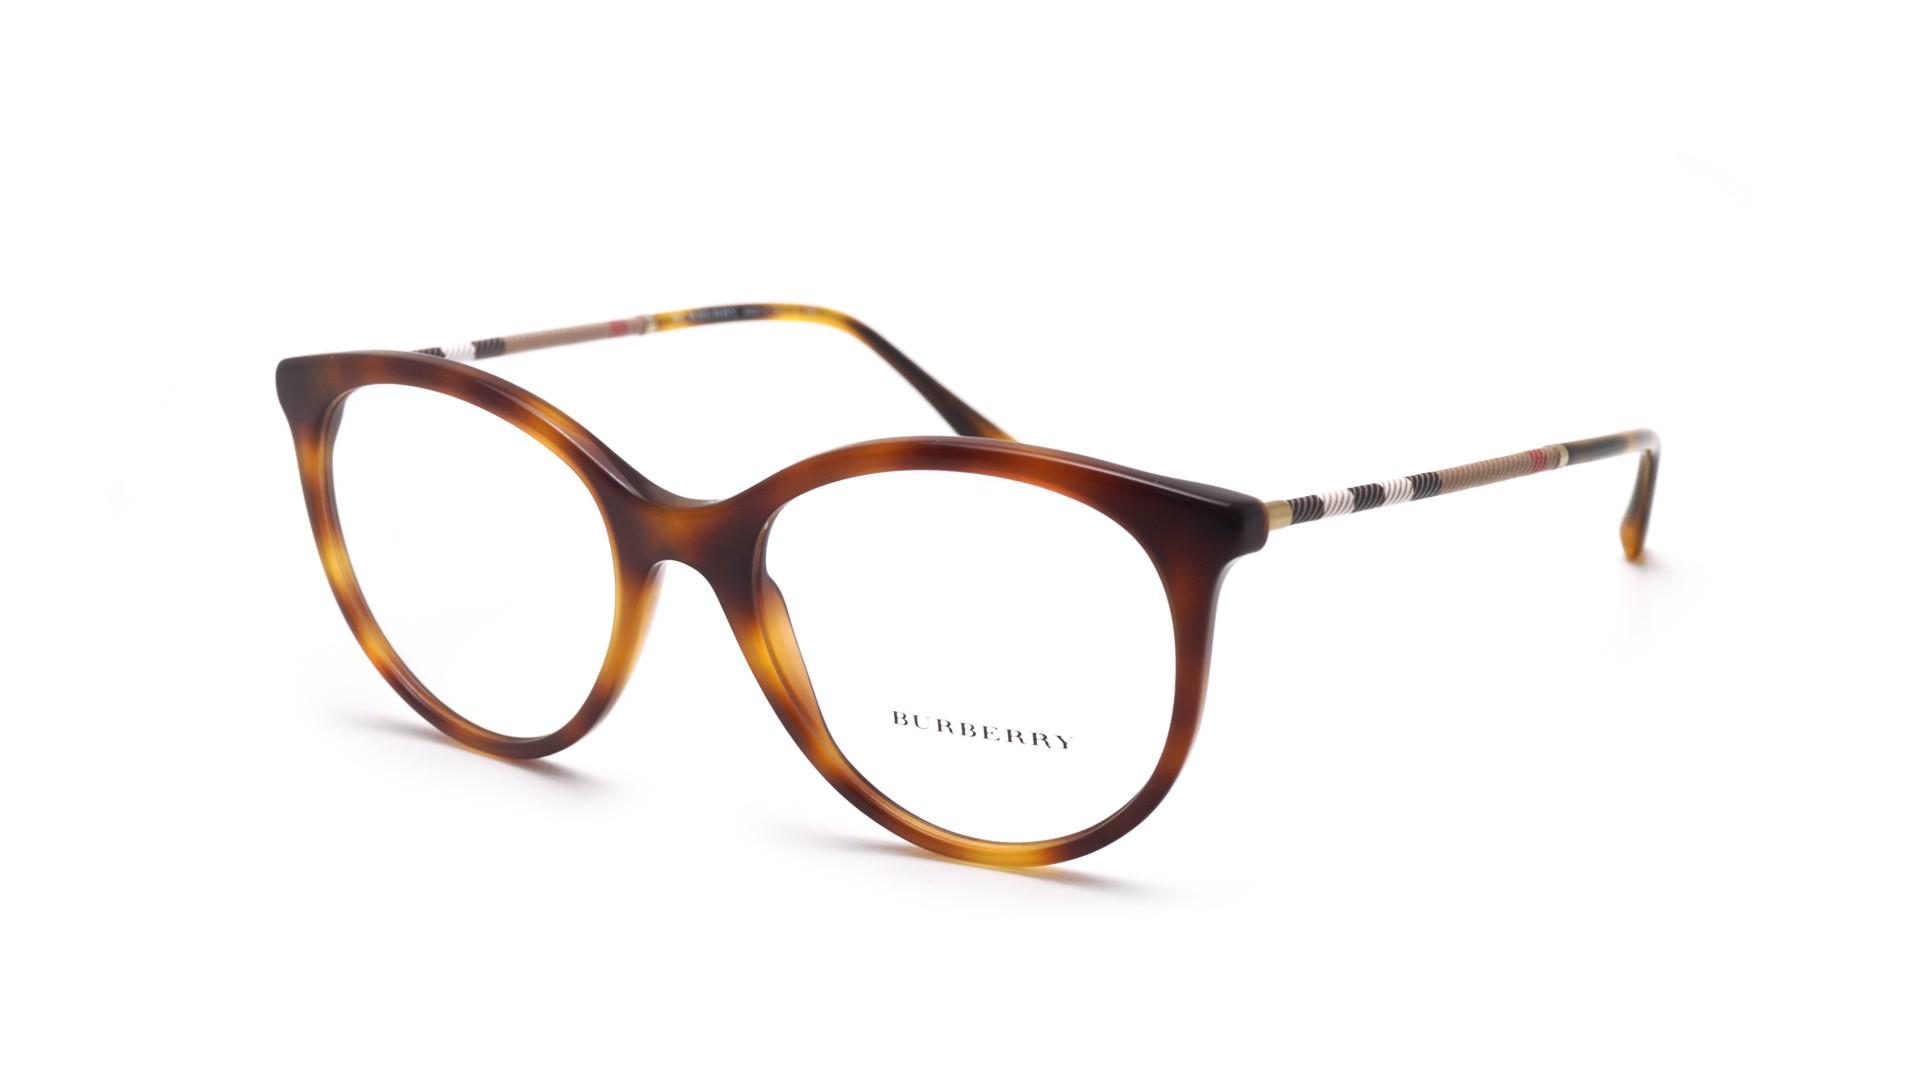 lunettes de vue burberry 2017. Black Bedroom Furniture Sets. Home Design Ideas